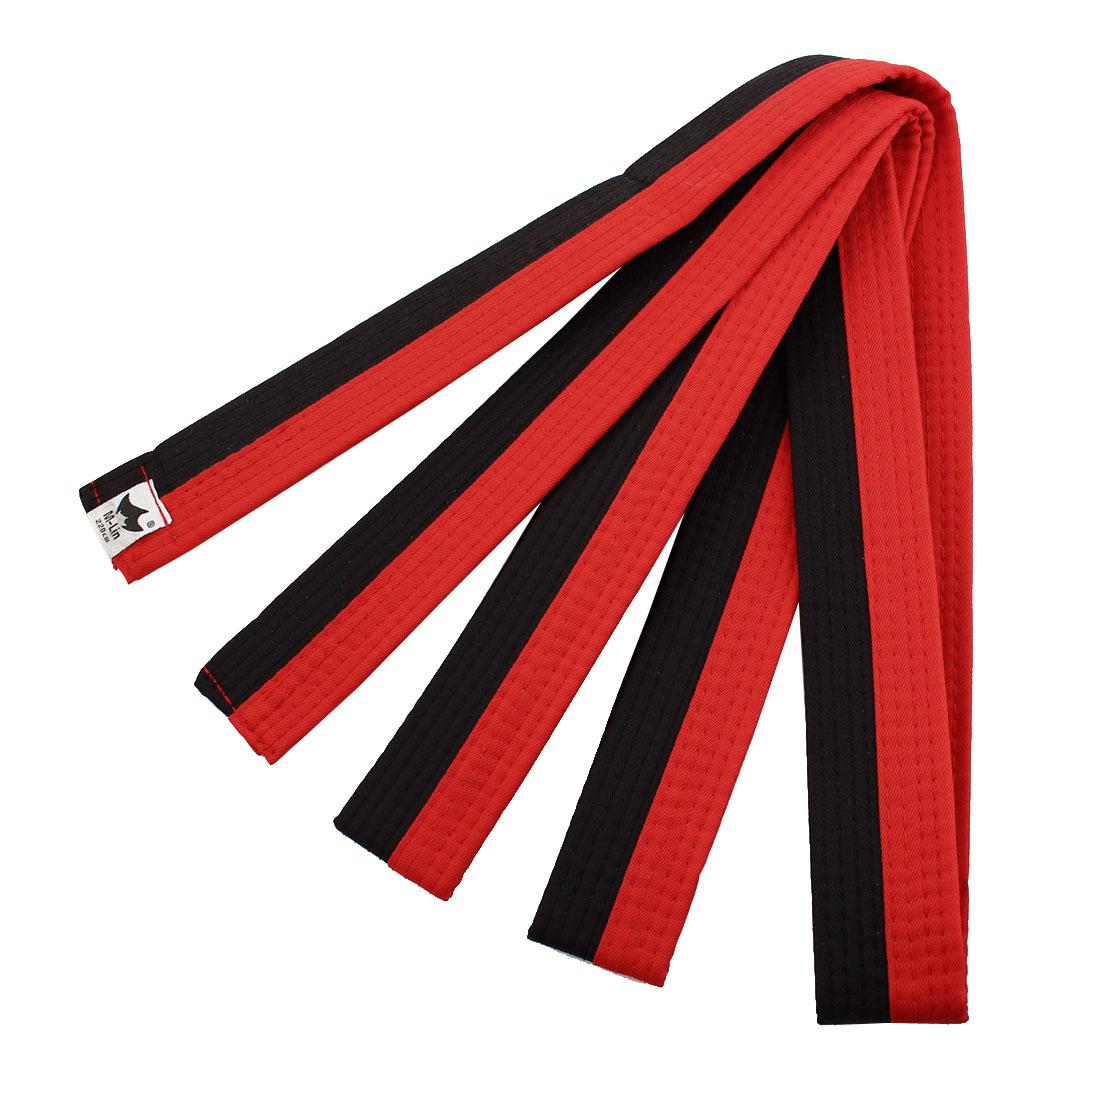 Solid Sporty Rank Tae Kwon Taekwondo Belt Martial Arts Karate Band Red Black